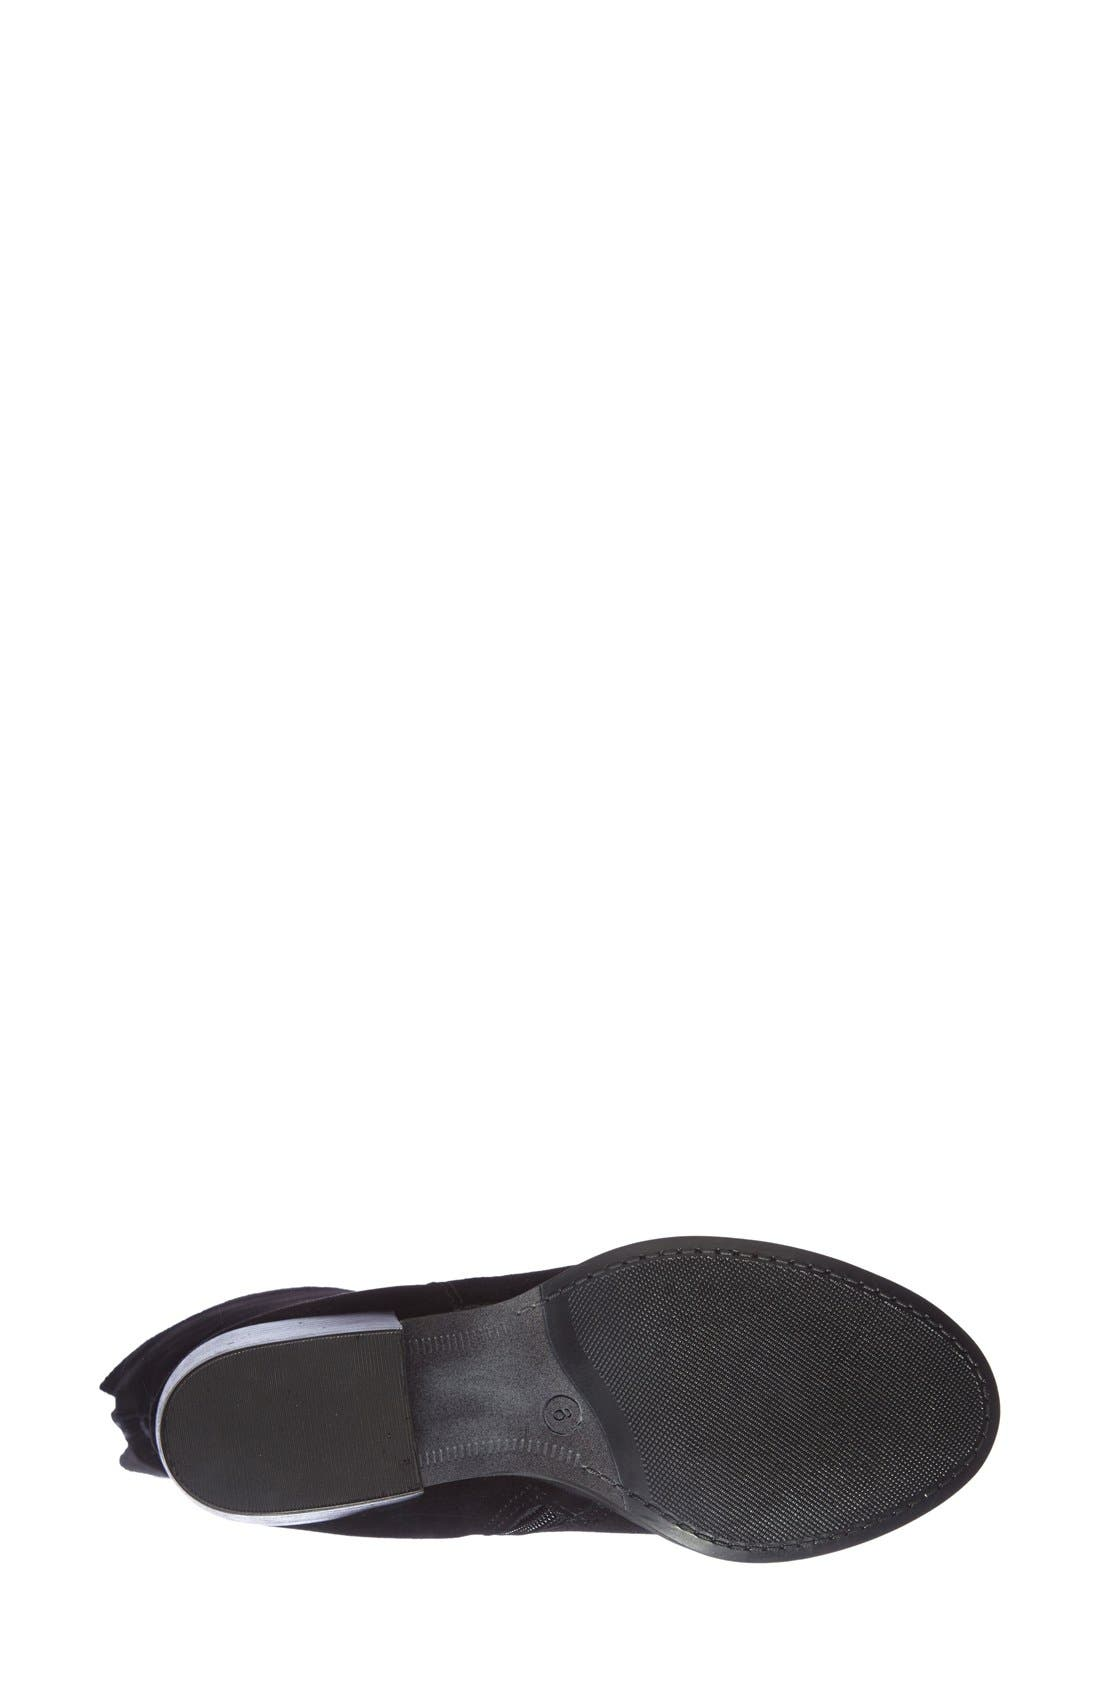 'Orabela' Knee High Boot,                             Alternate thumbnail 2, color,                             006